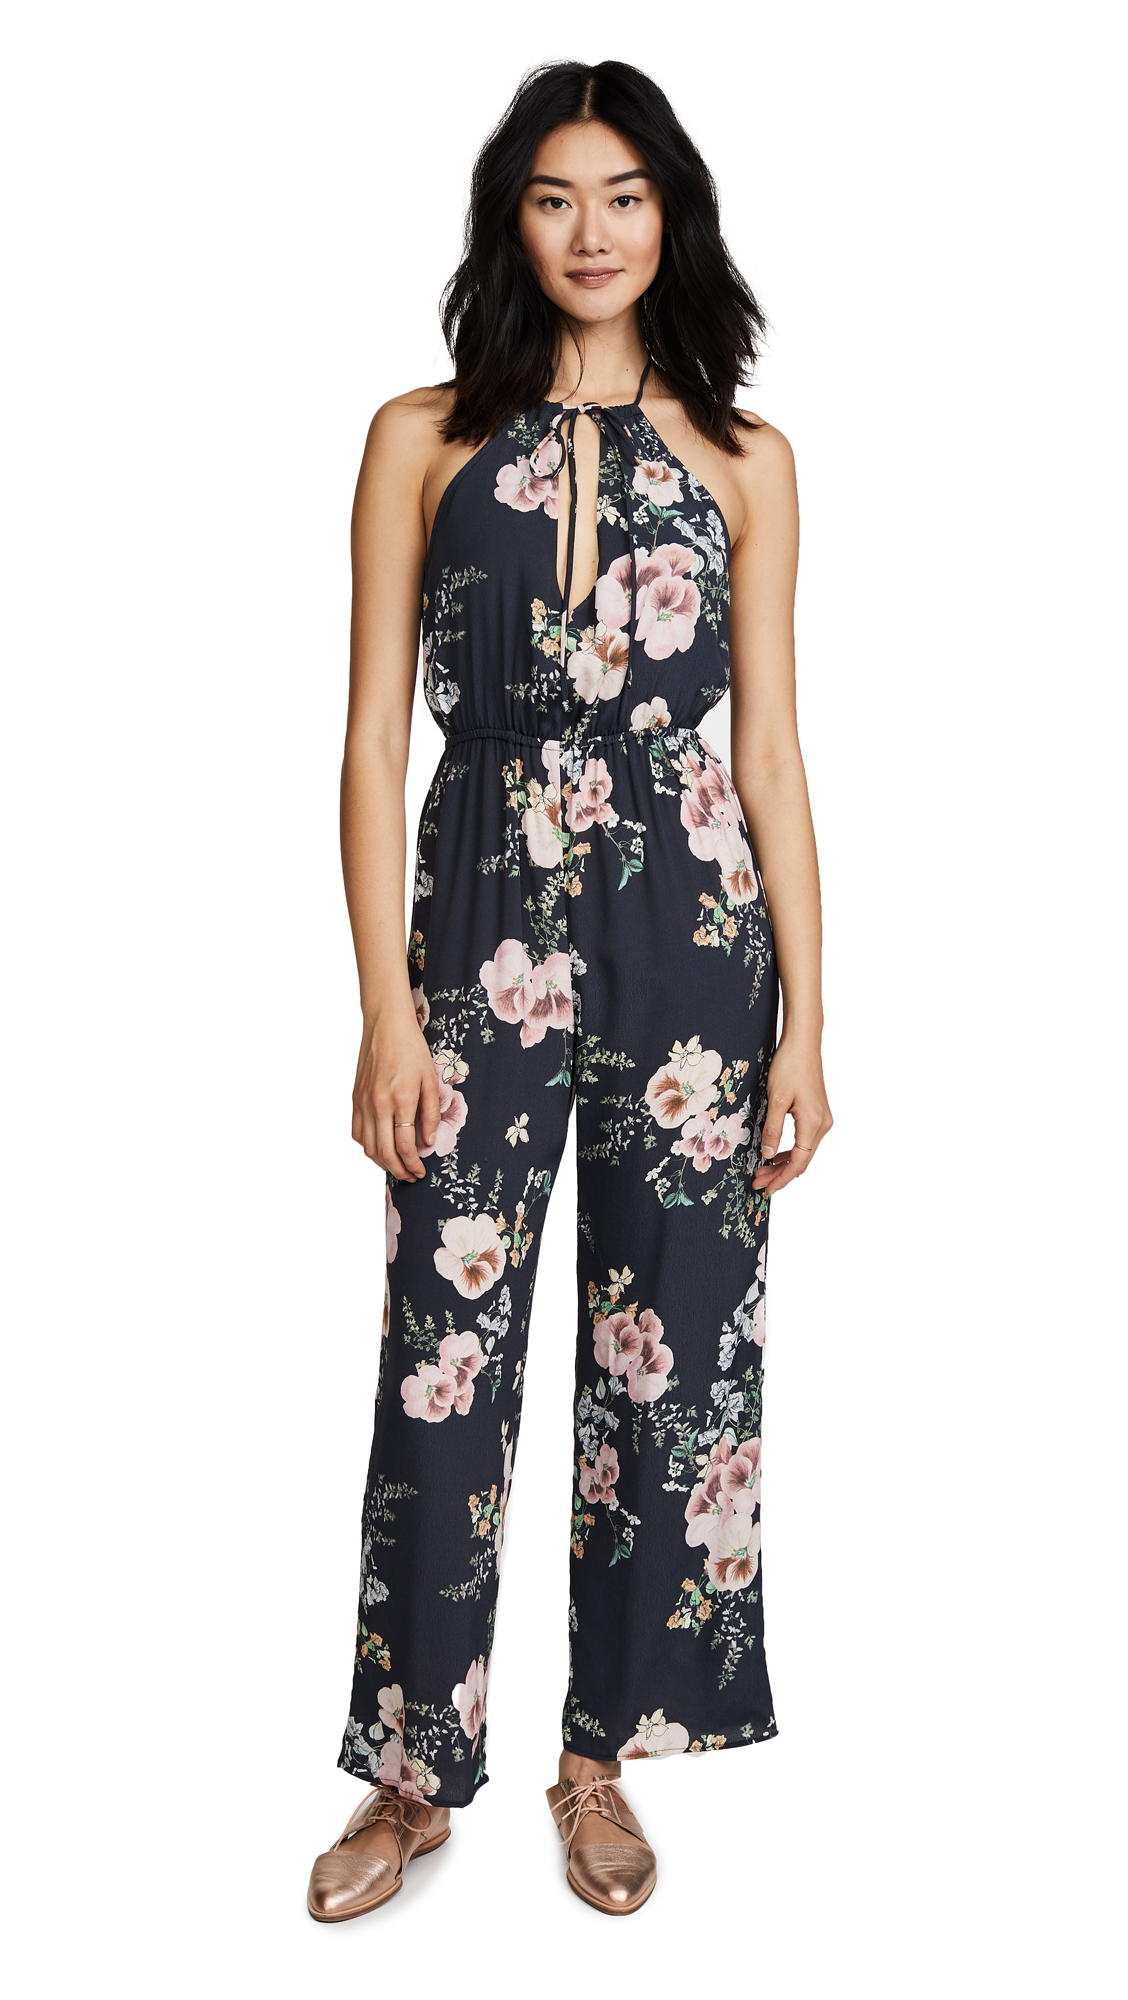 Roe + May Tova Jumpsuit - Indigo Bouquet Print